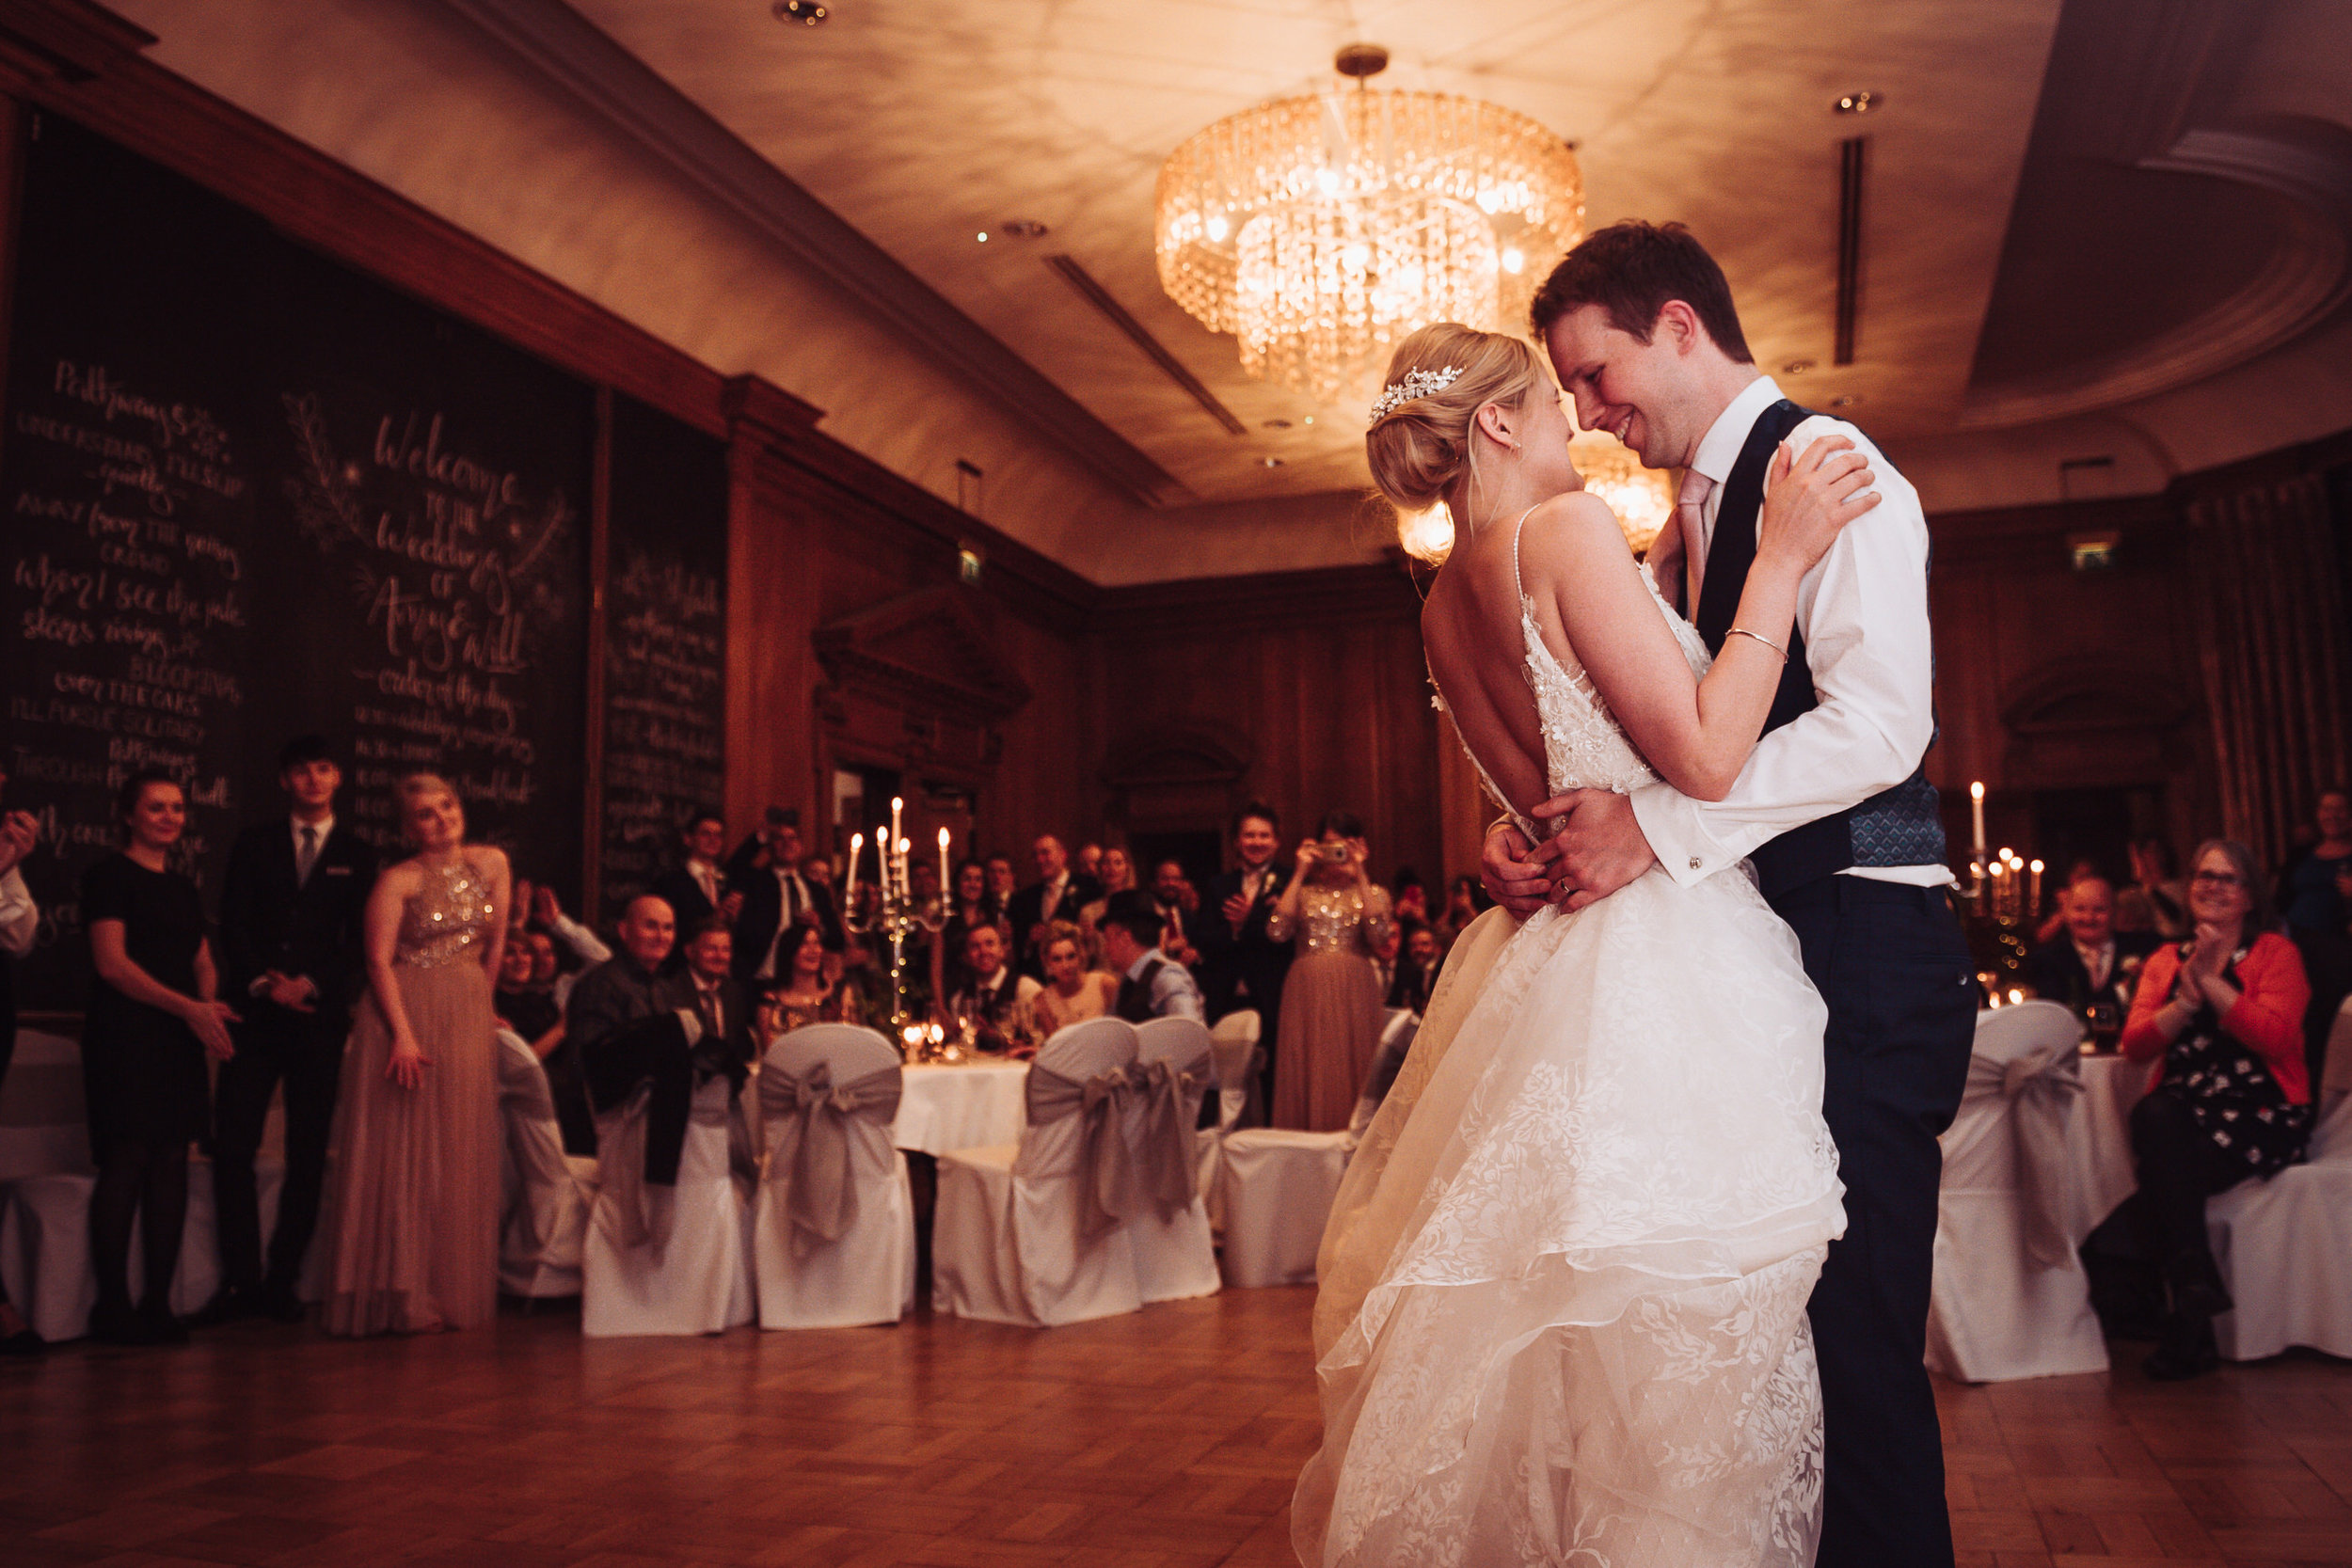 The-Grand-Hotel-York-wedding-photographer-11.jpg